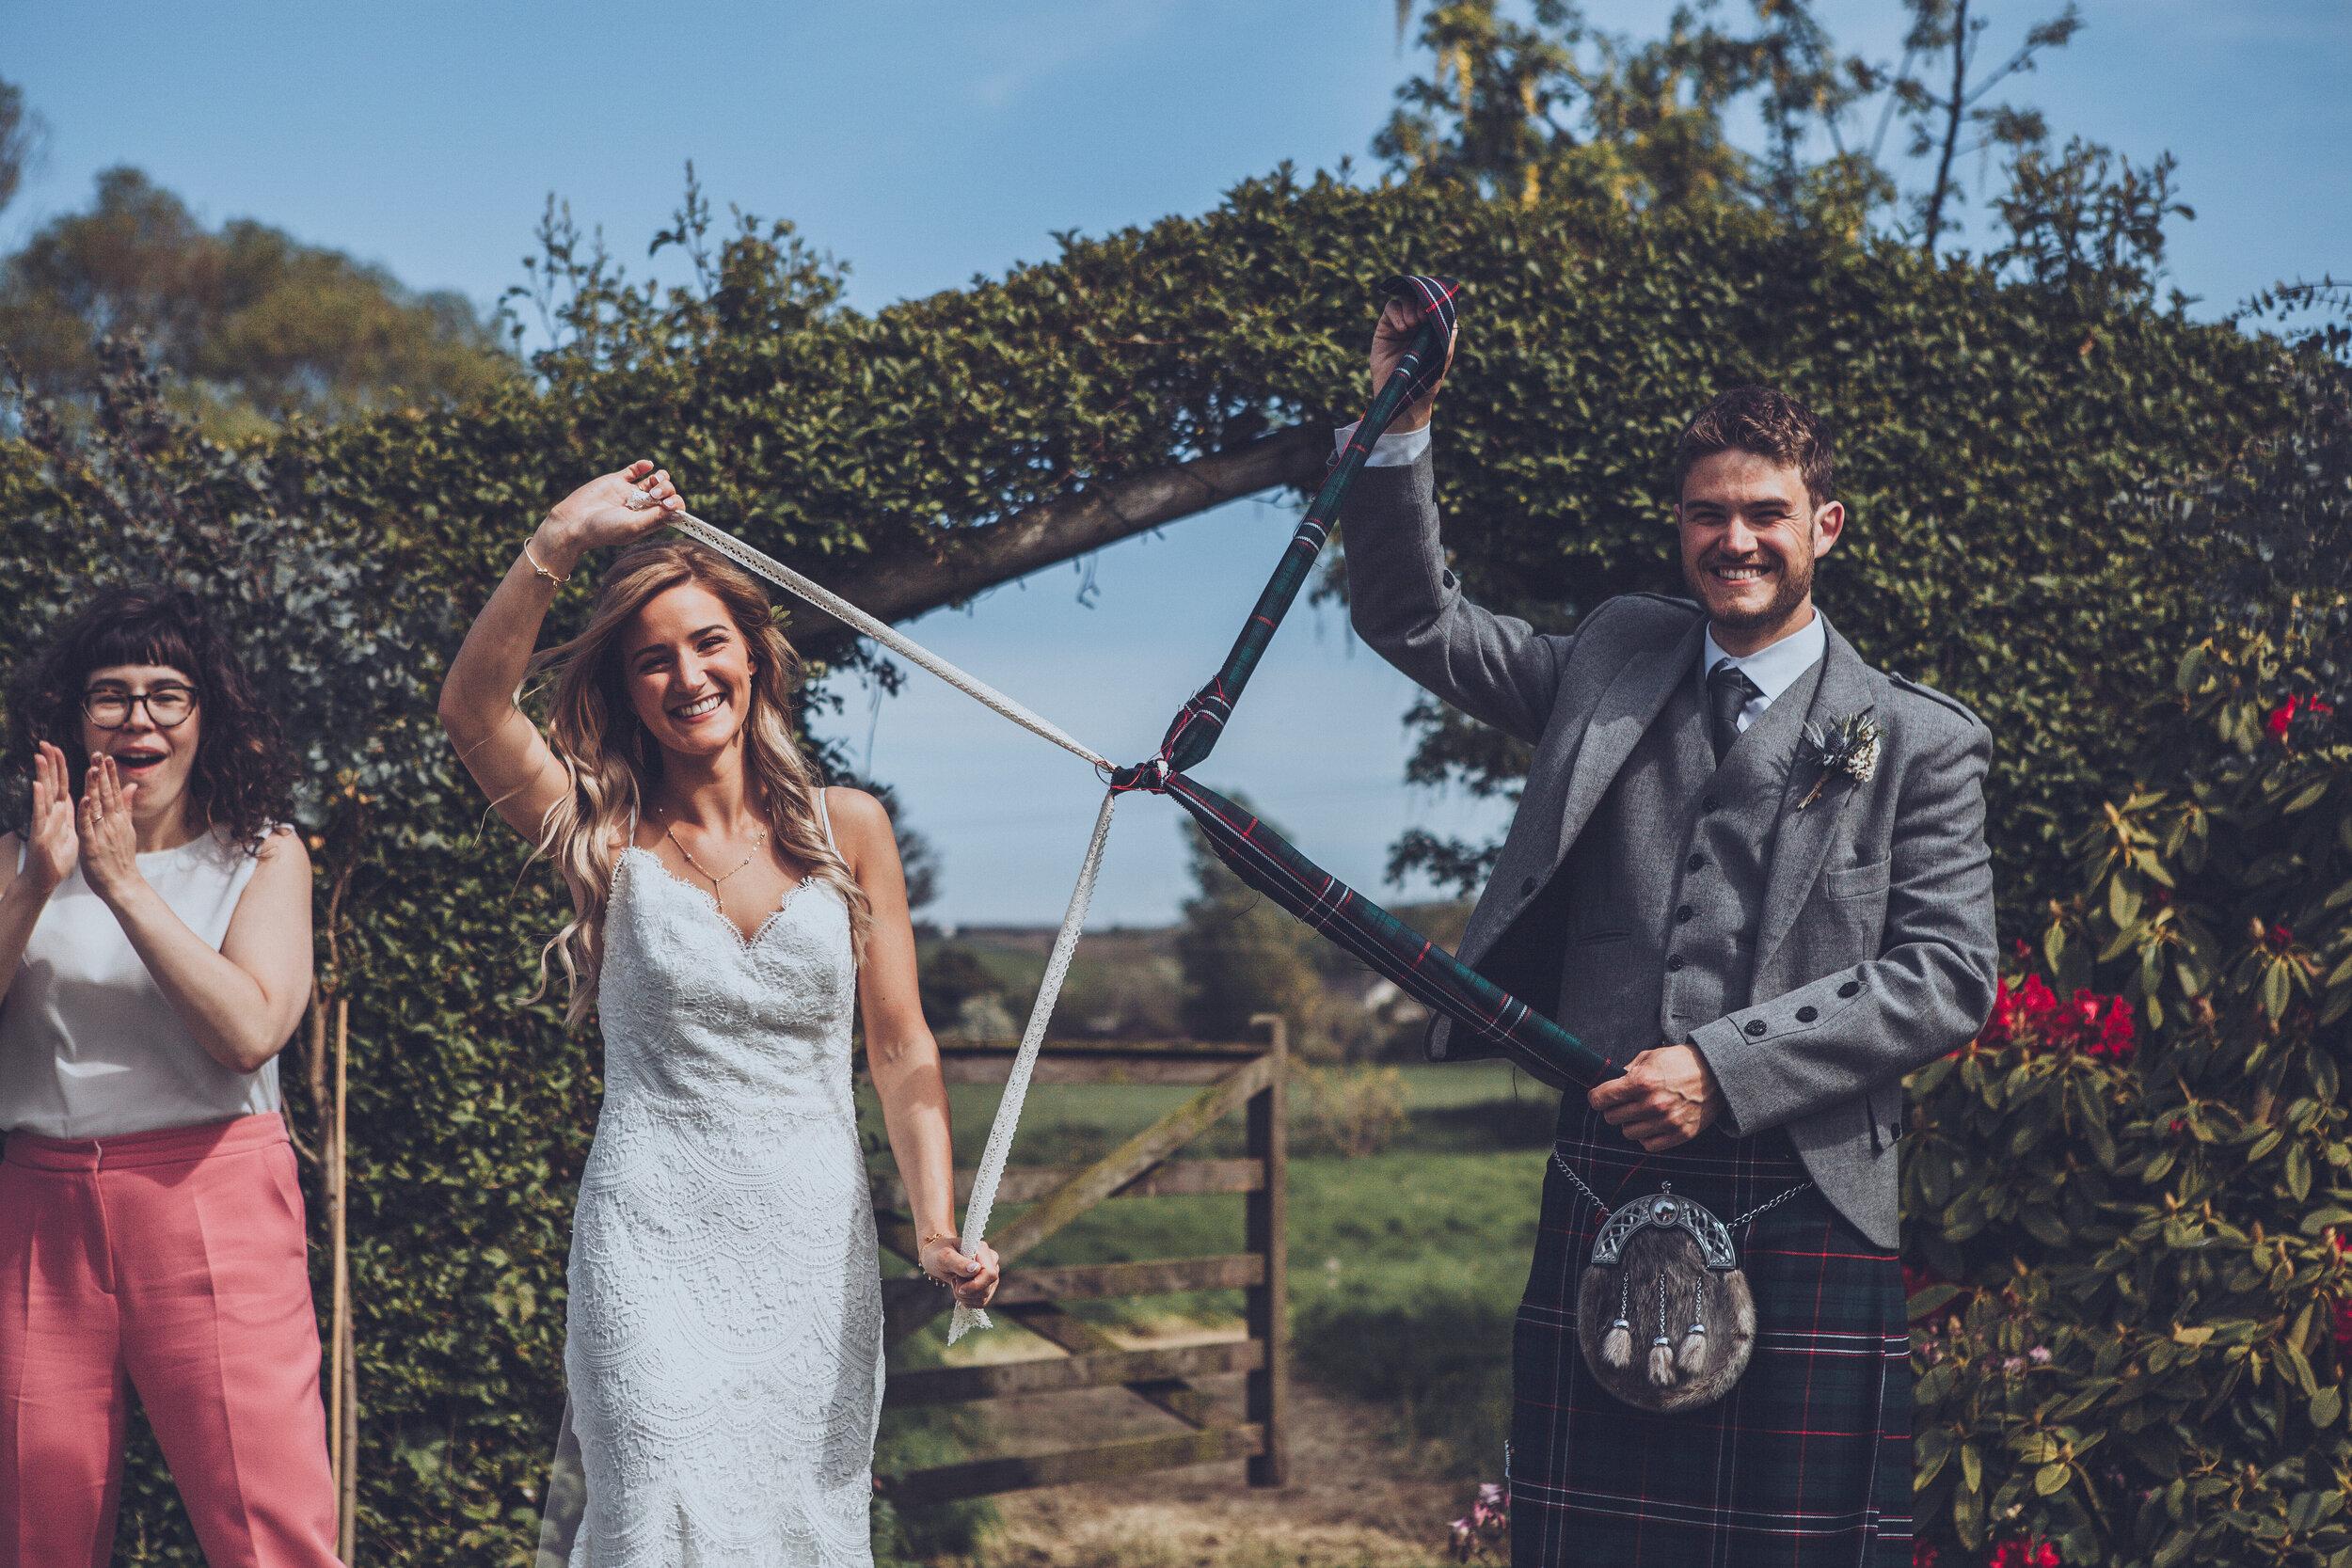 Dalduff Farm Ayrshire Wedding Photography - Claire Basiuk Photographer - 09.jpg